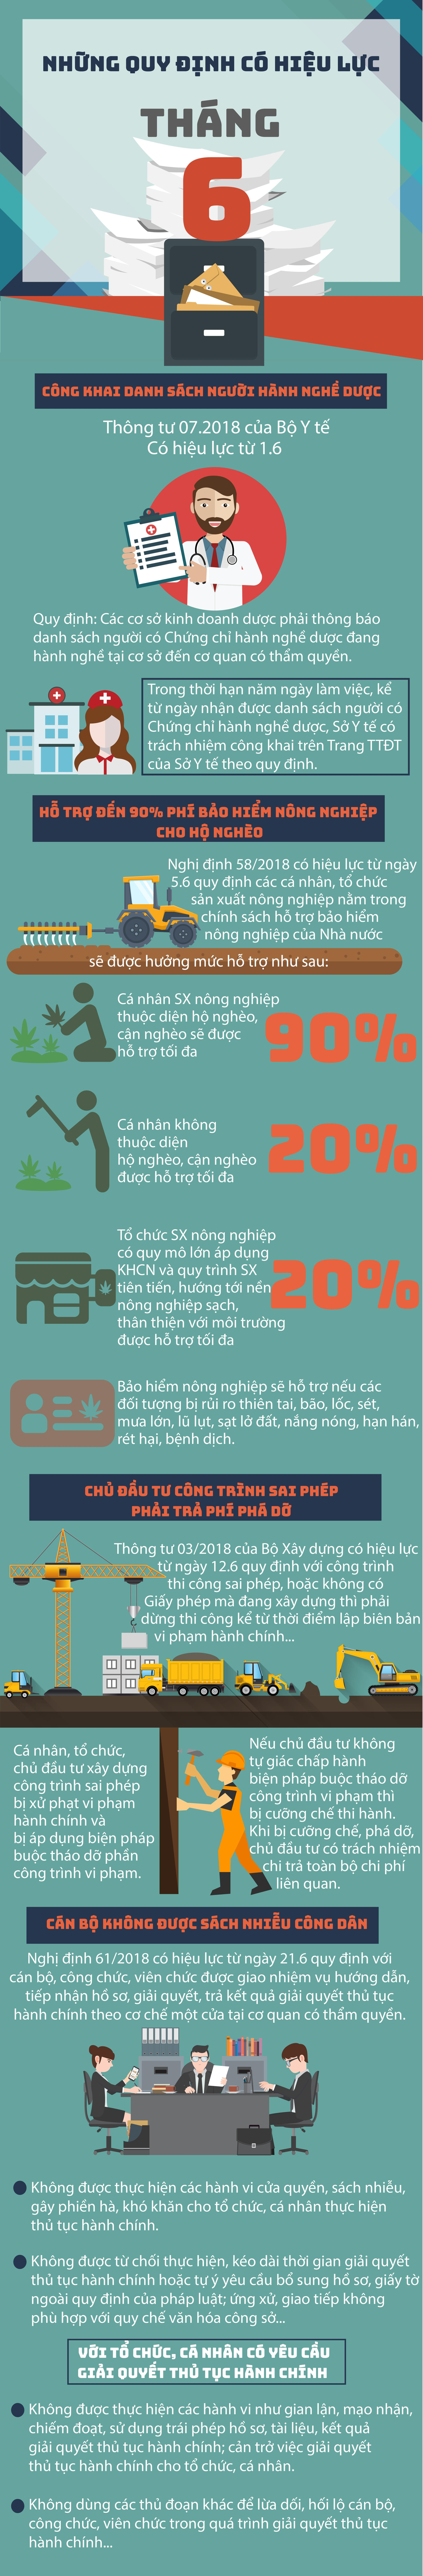 infographic nhung chinh sach co hieu luc tu 16